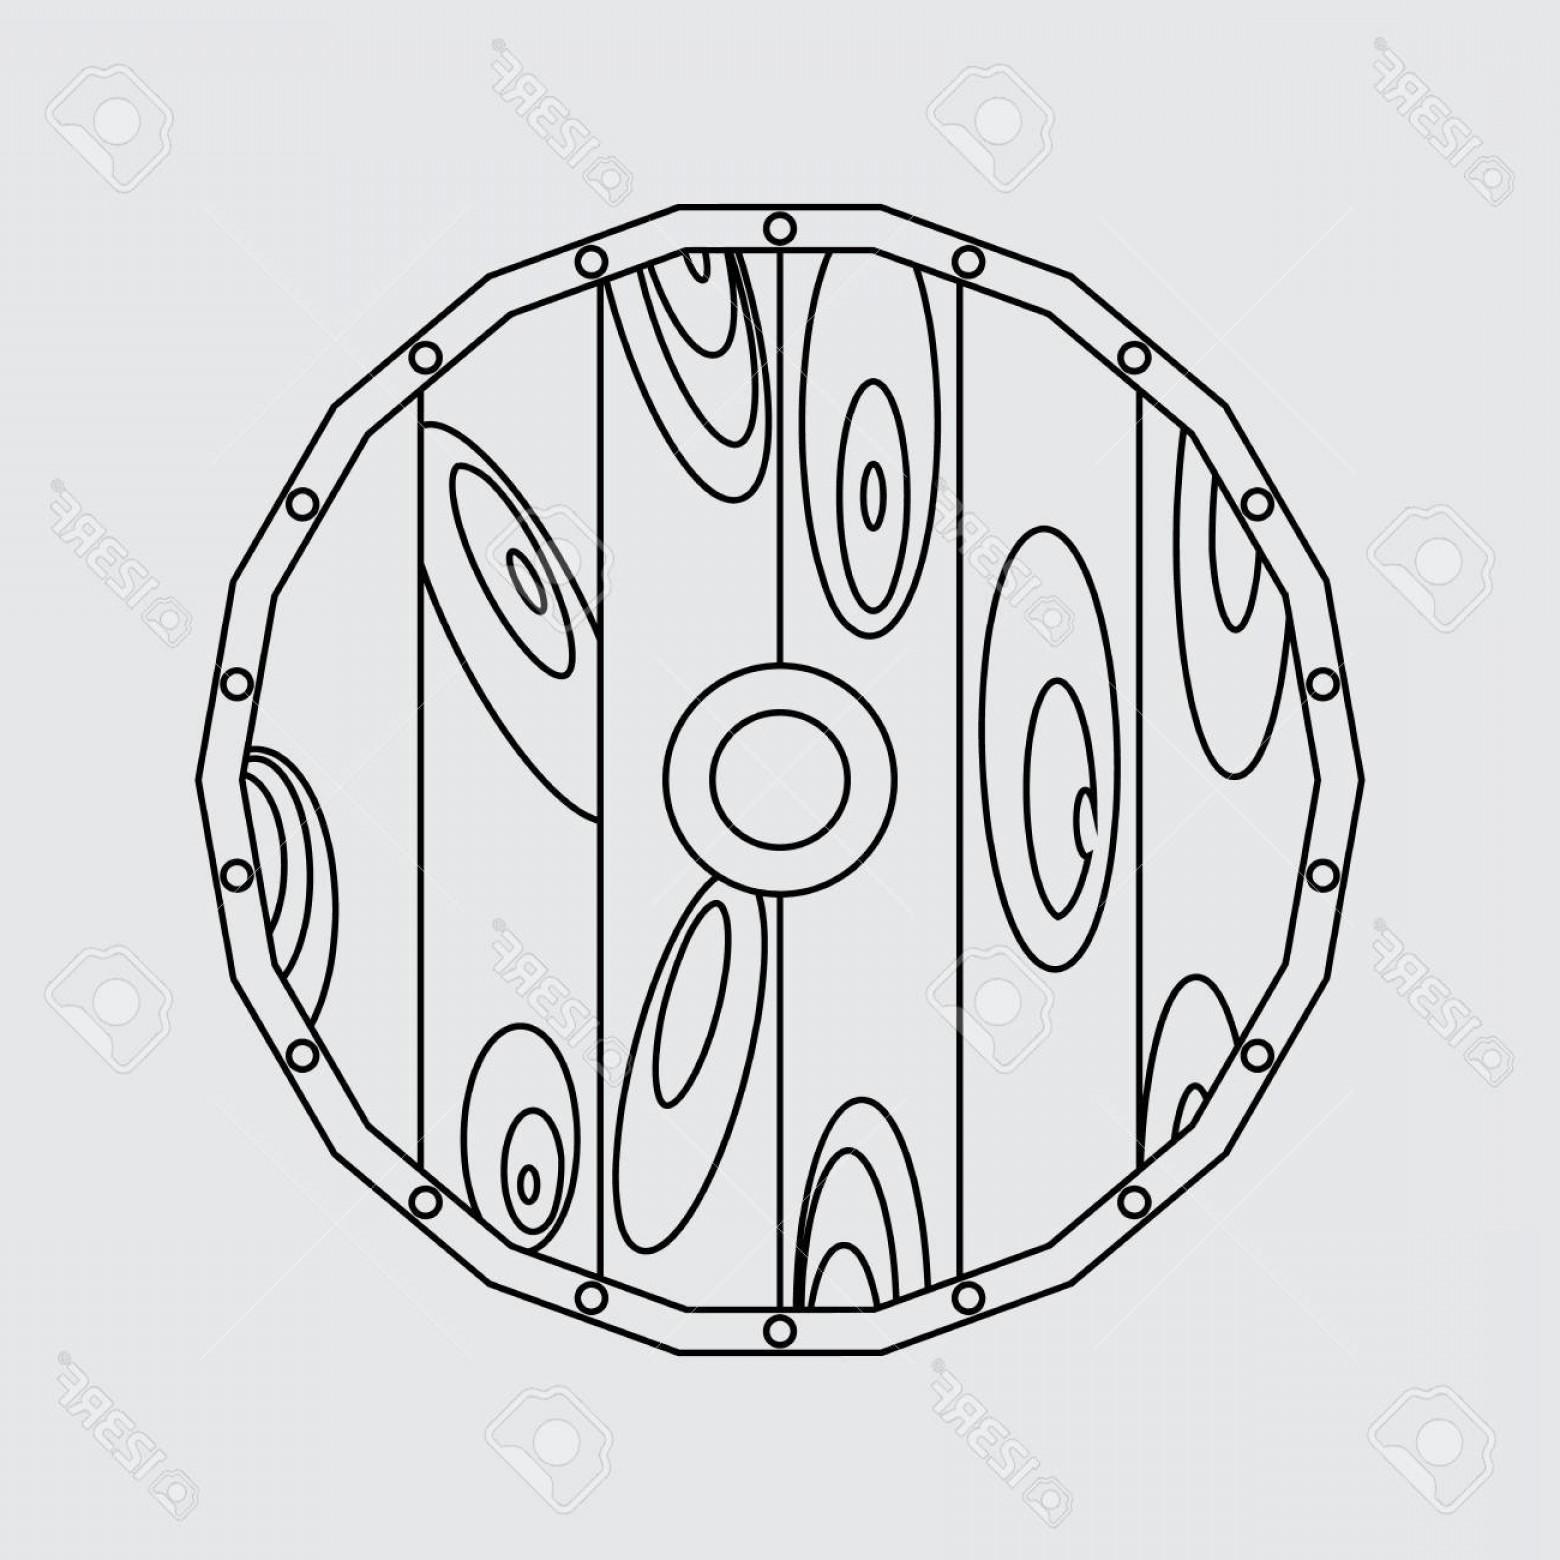 1560x1560 Photostock Vector Viking Shield Flat Style Vector Line Icon